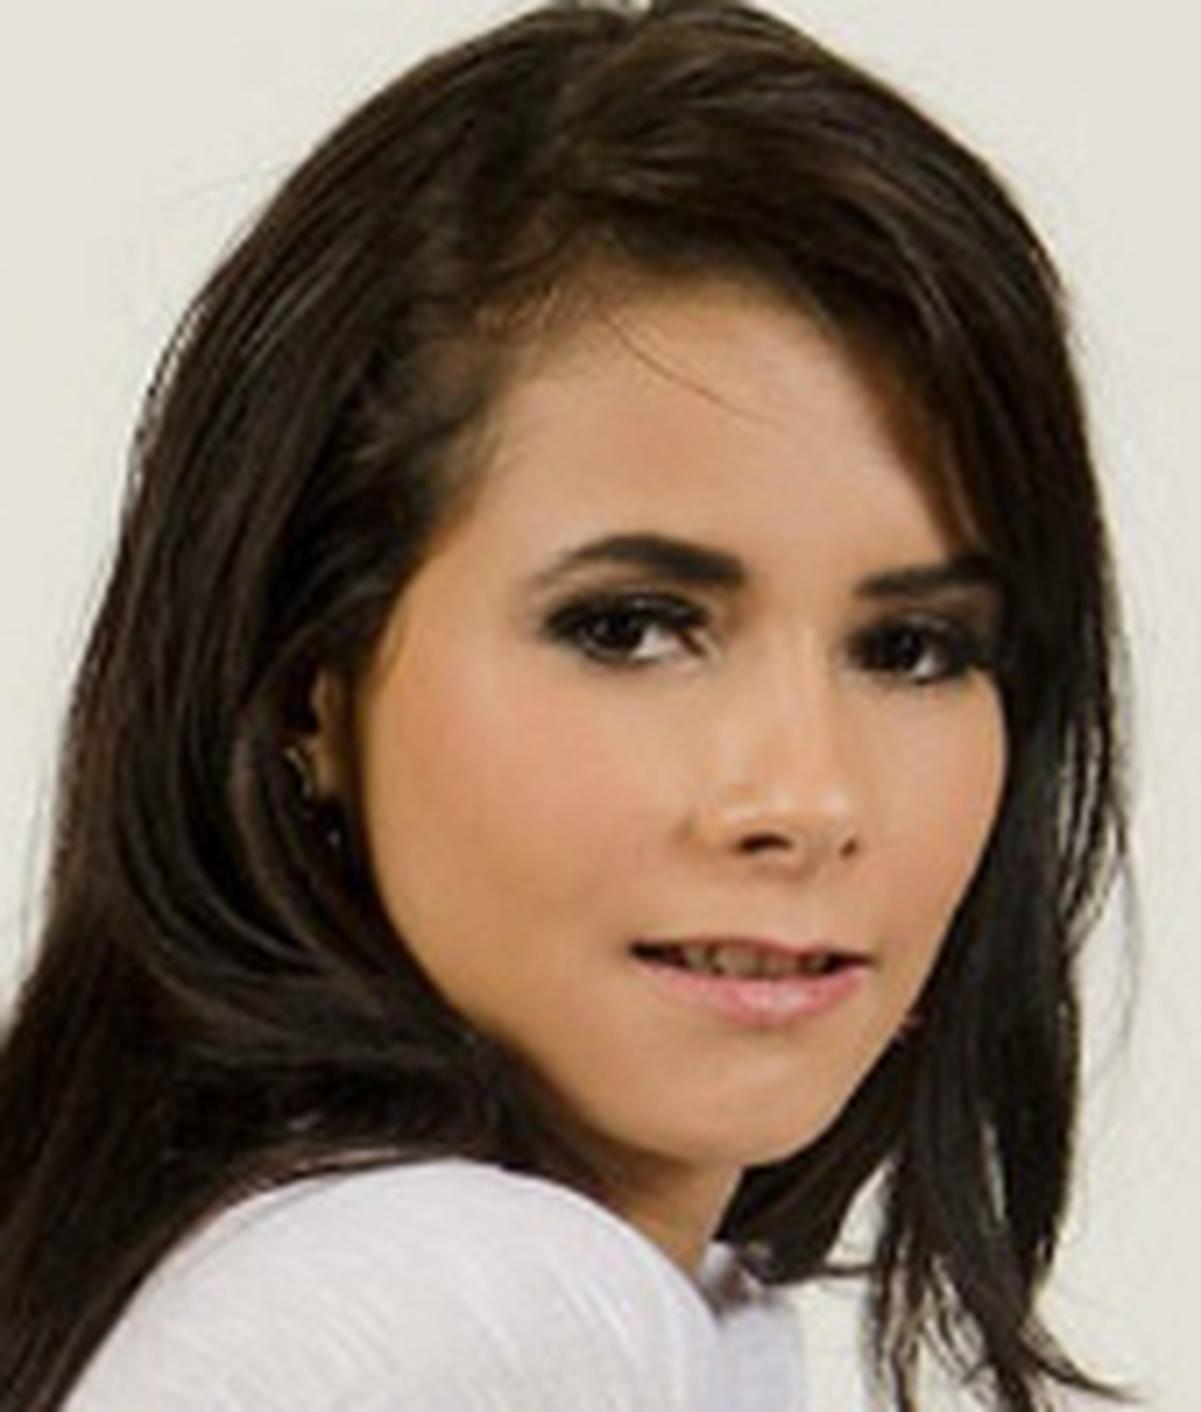 Loren Colombara